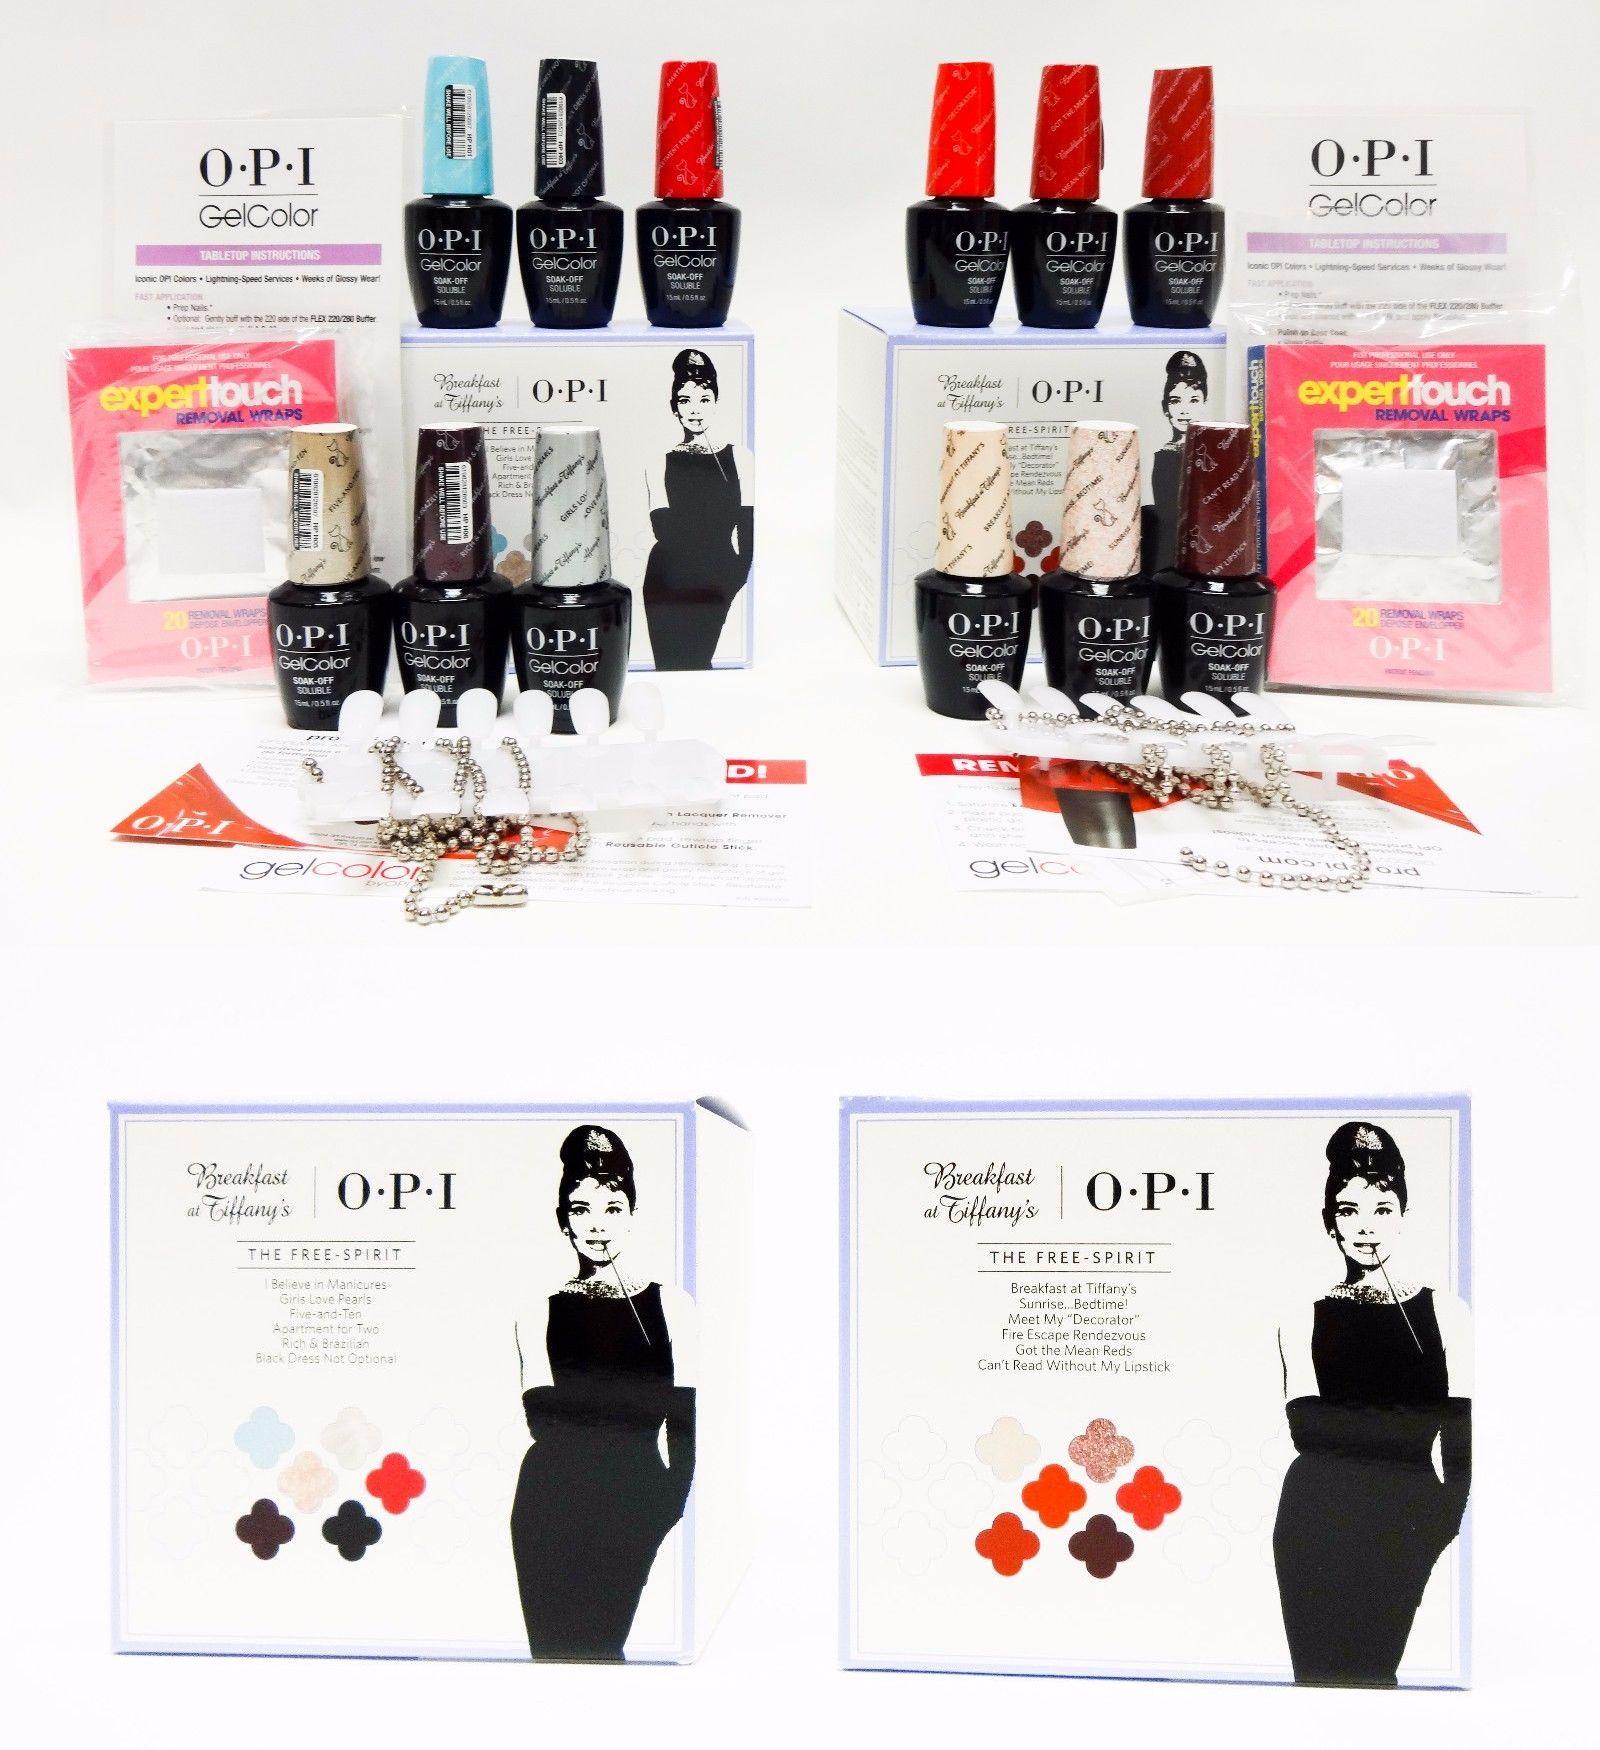 Gel Nails: Opi Nail Gelcolor Breakfast At Tiffany S Audrey Hepburn ...